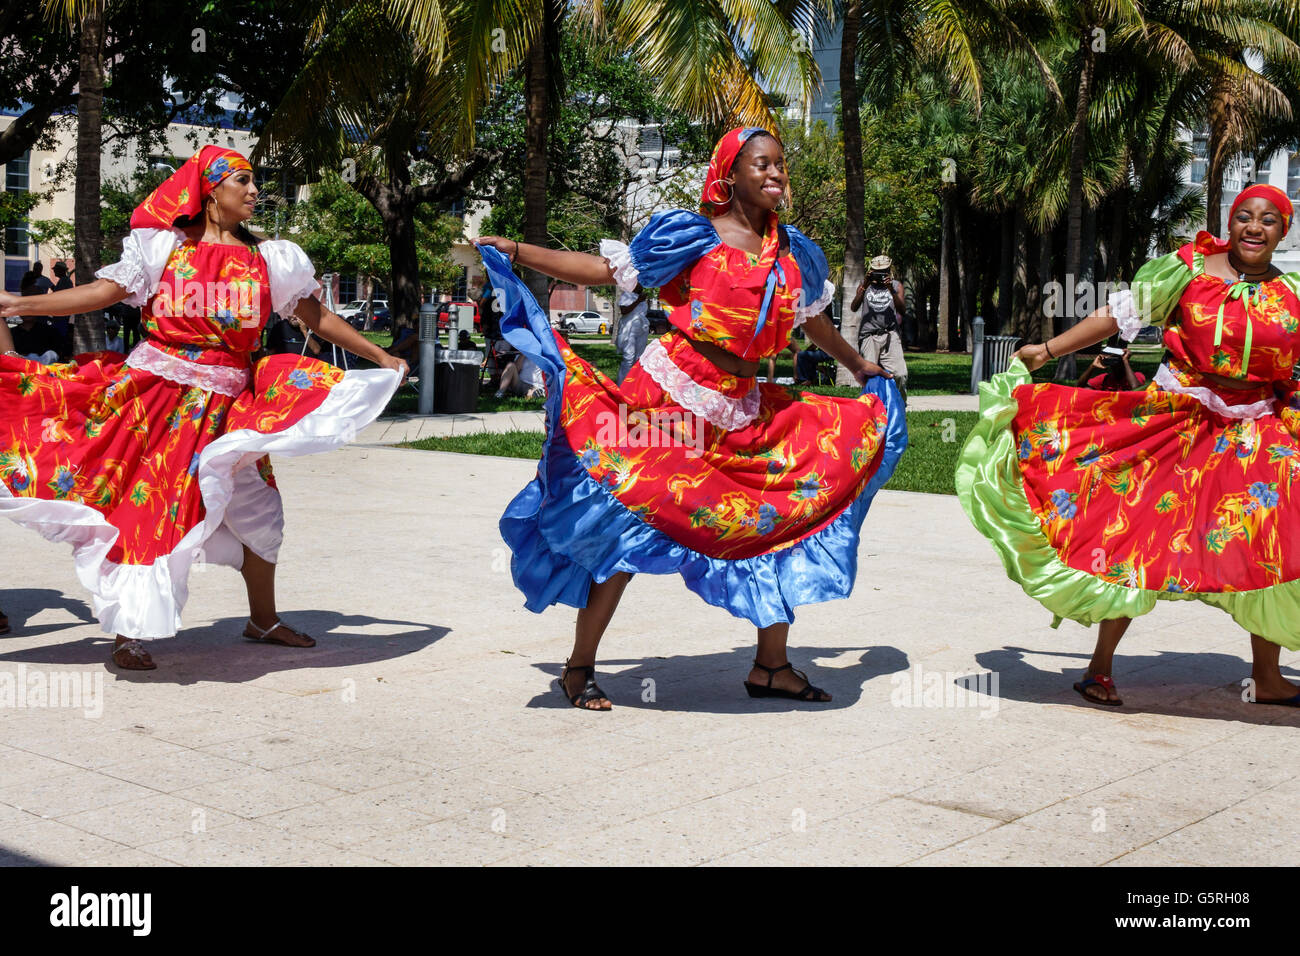 Florida Miami Beach Haitian woman dancers costume outfit ...